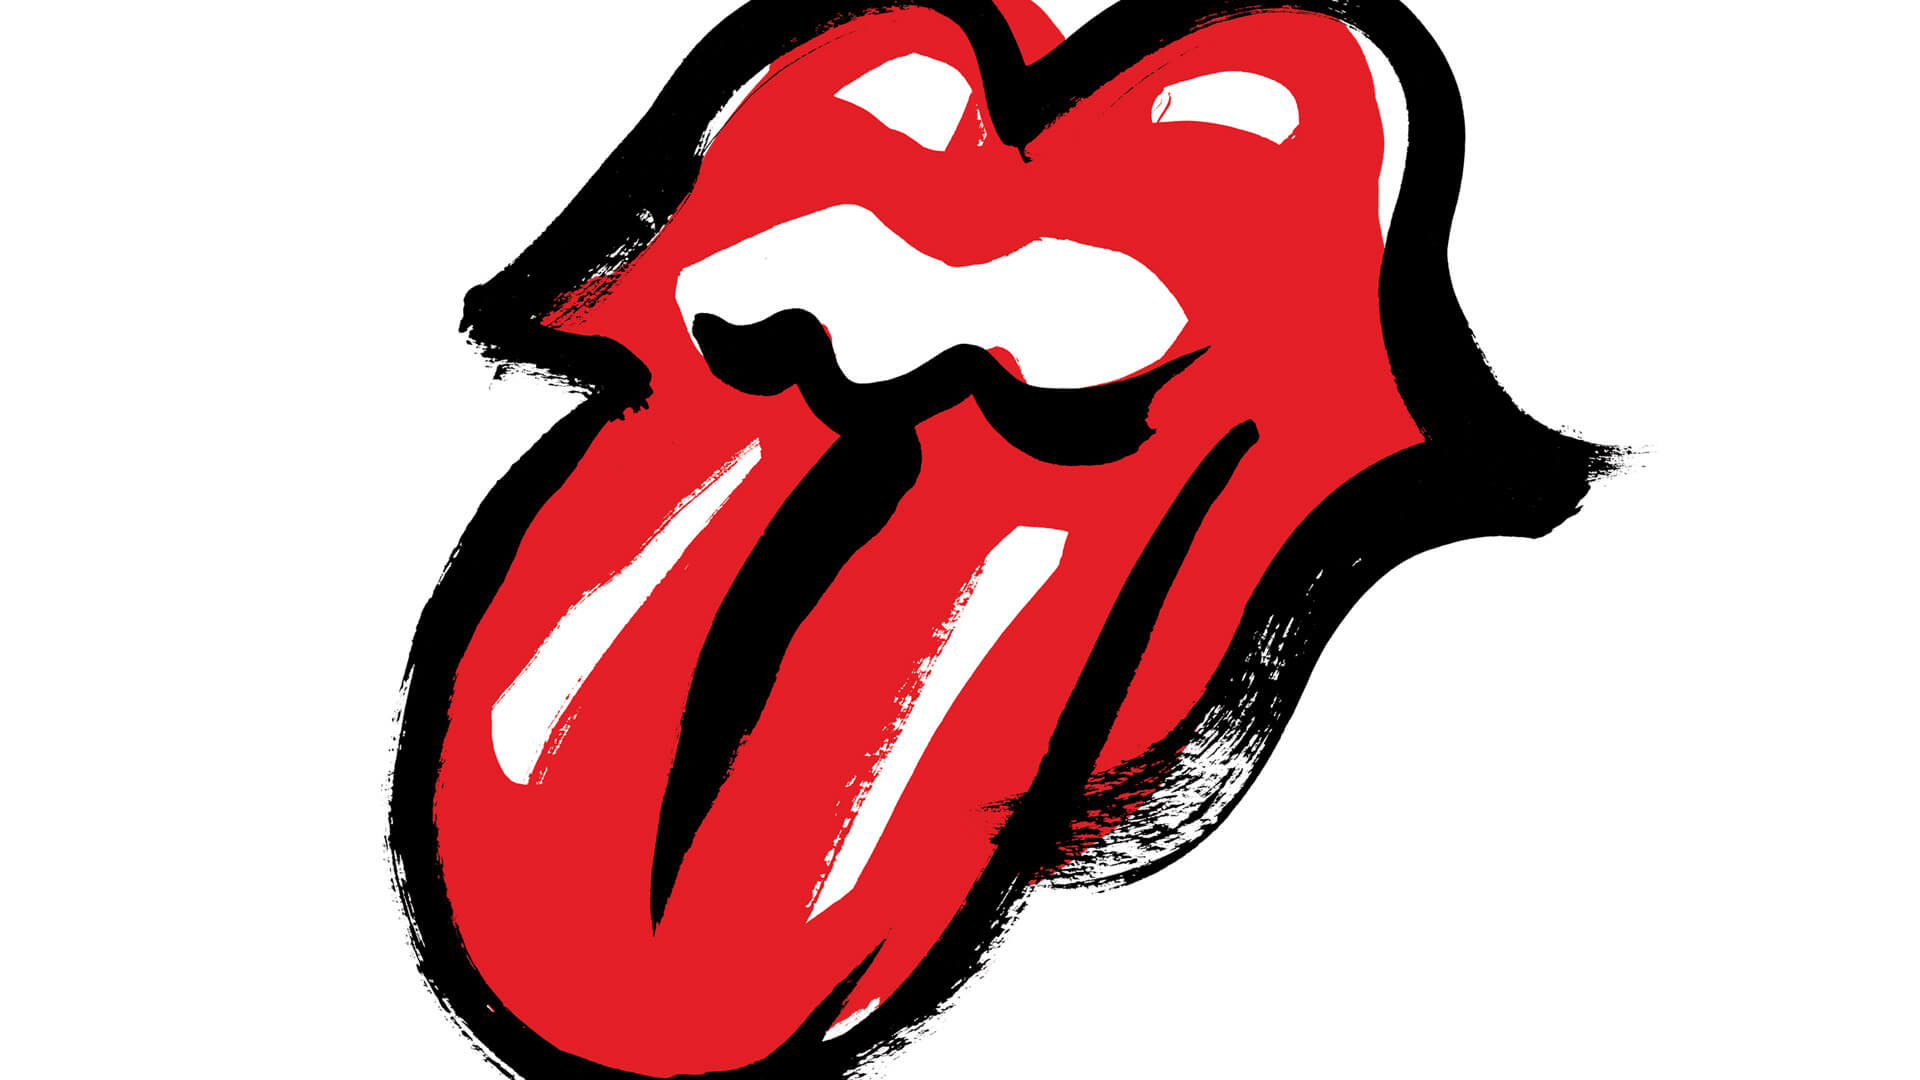 rolling stones no filter tongue logo